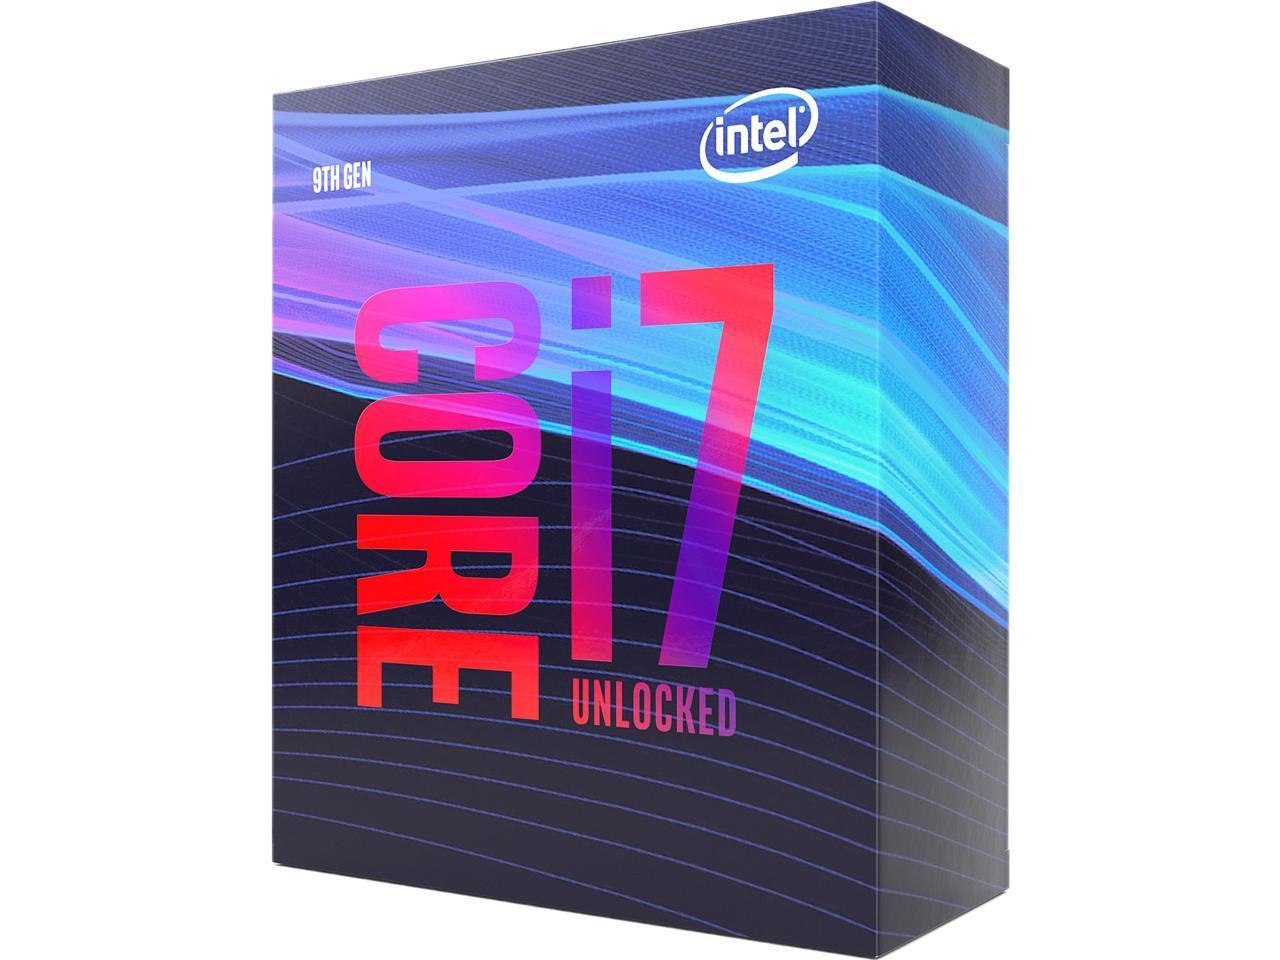 Unlocked 9th Gen Intel® Core<sup>TM</sup> i9-9900K Processor